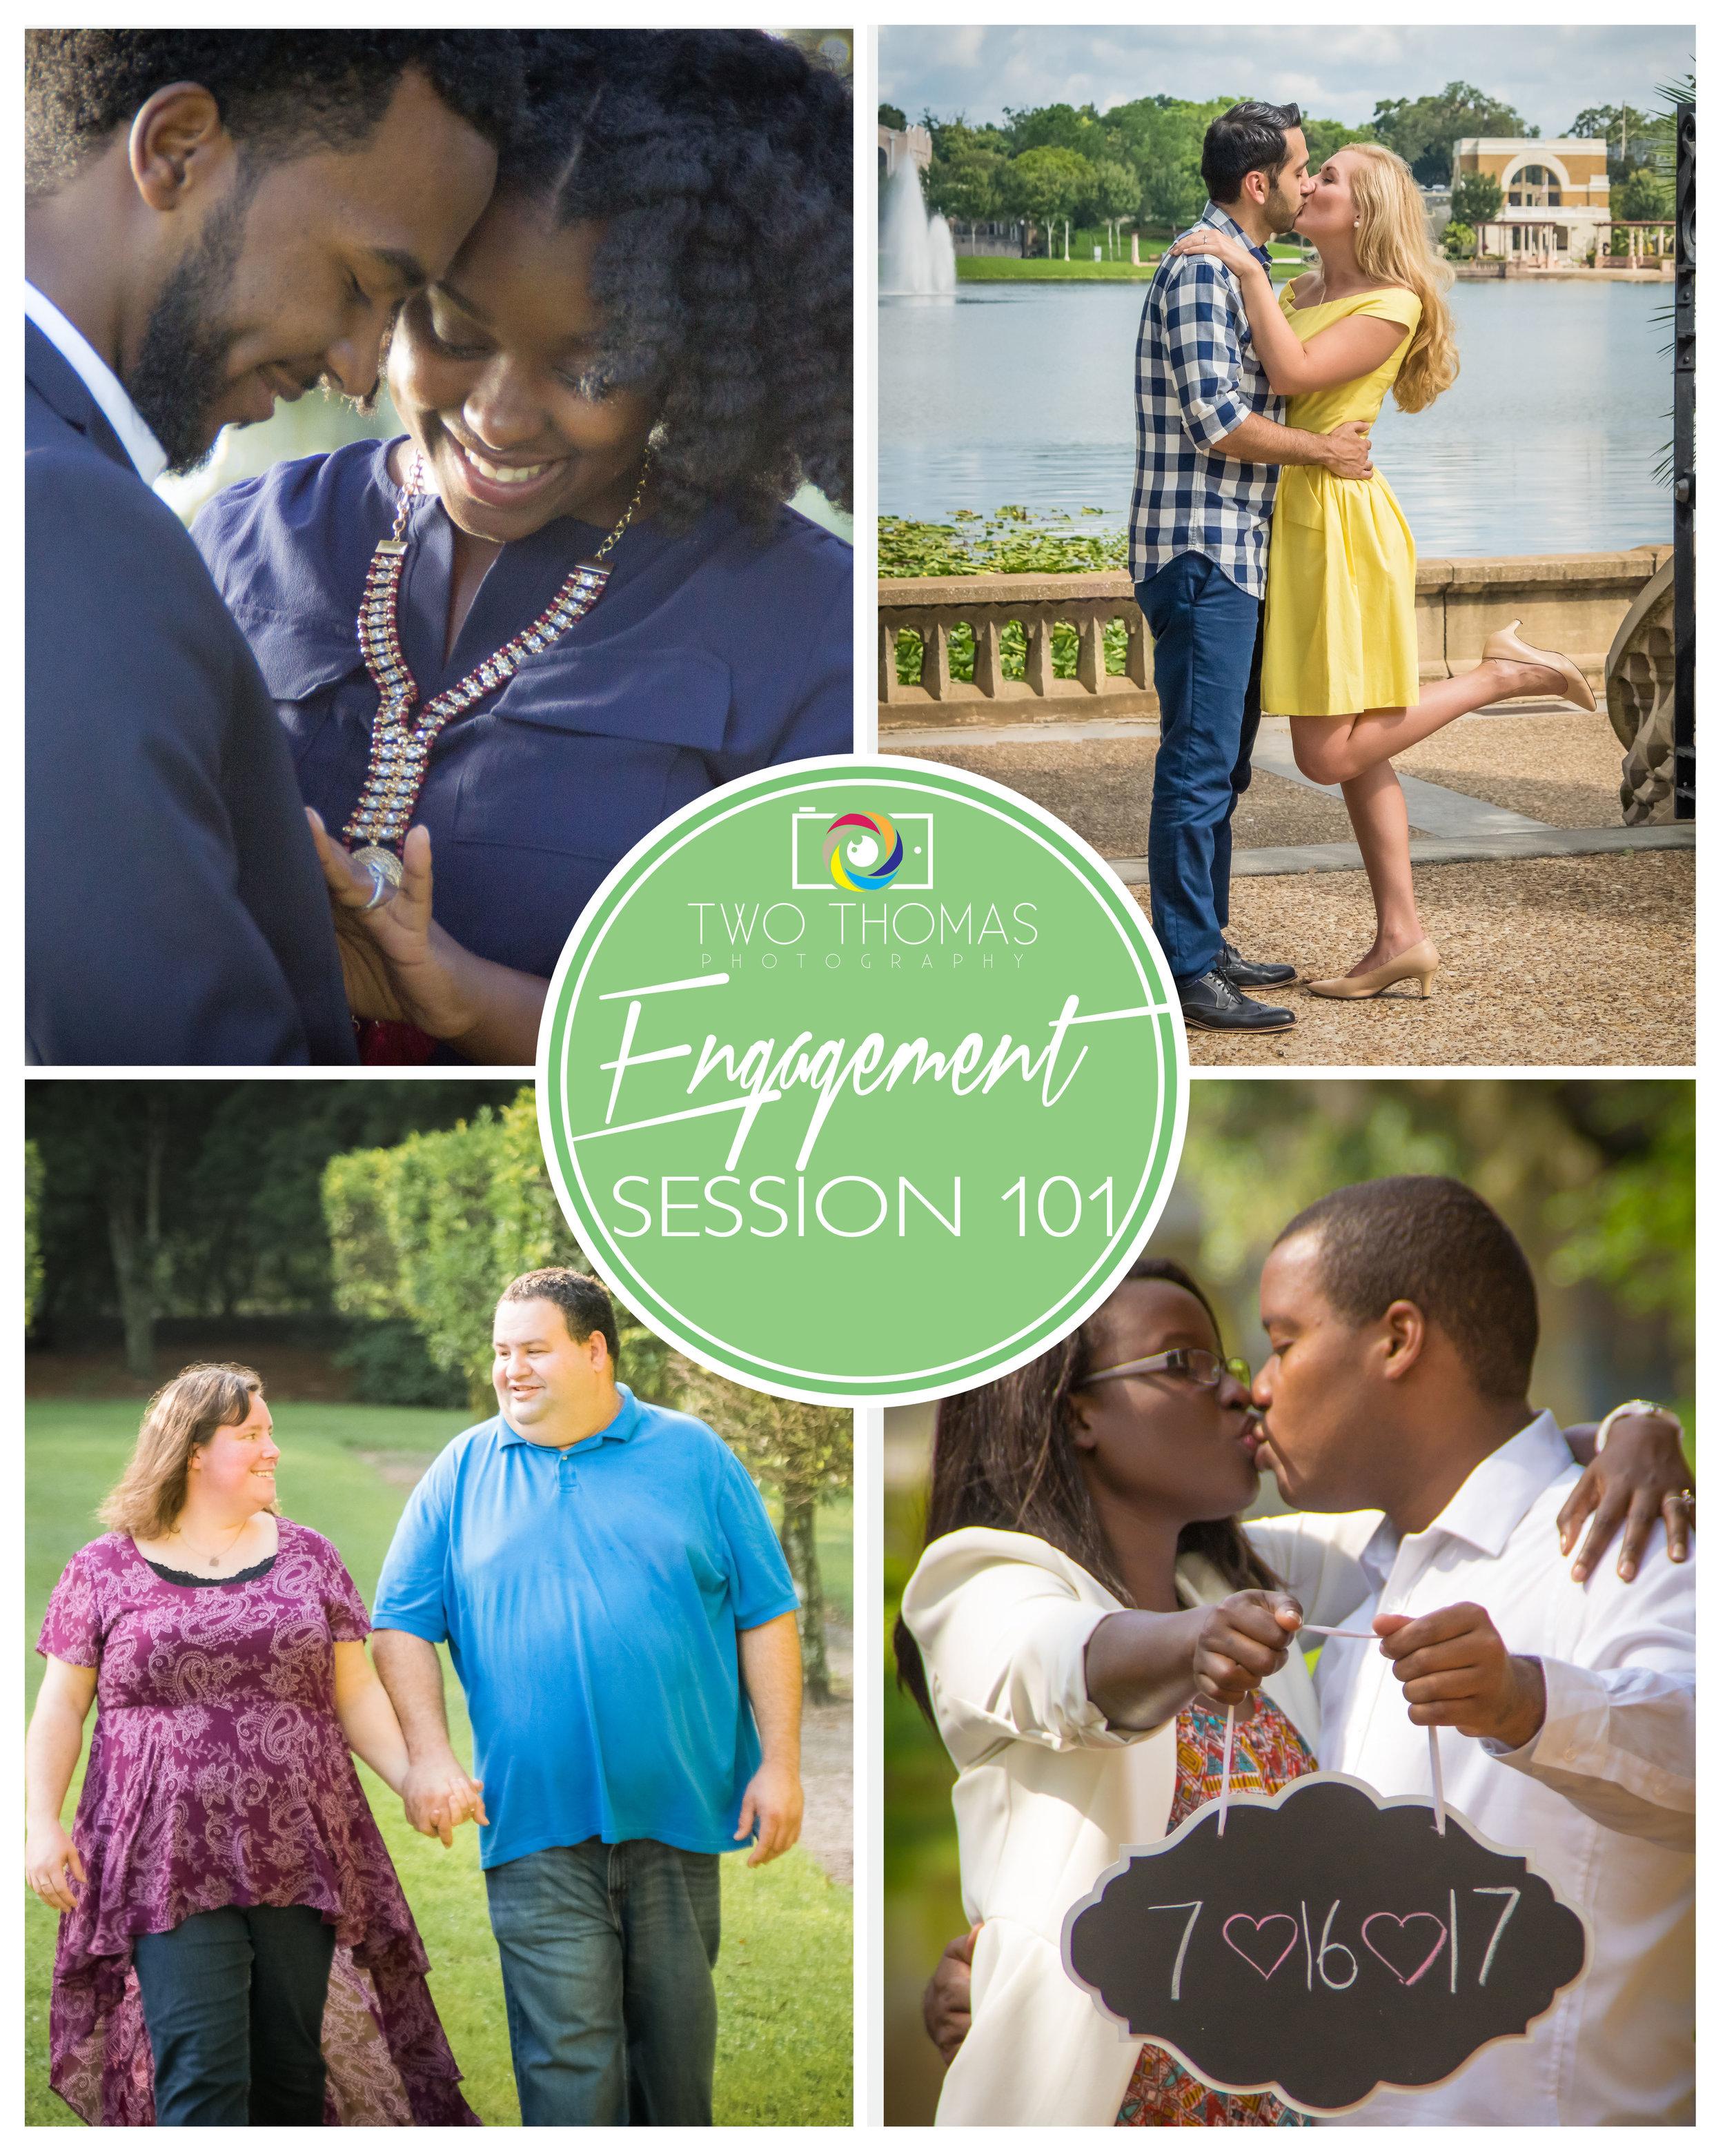 Engagement Session 101 blog board.jpg